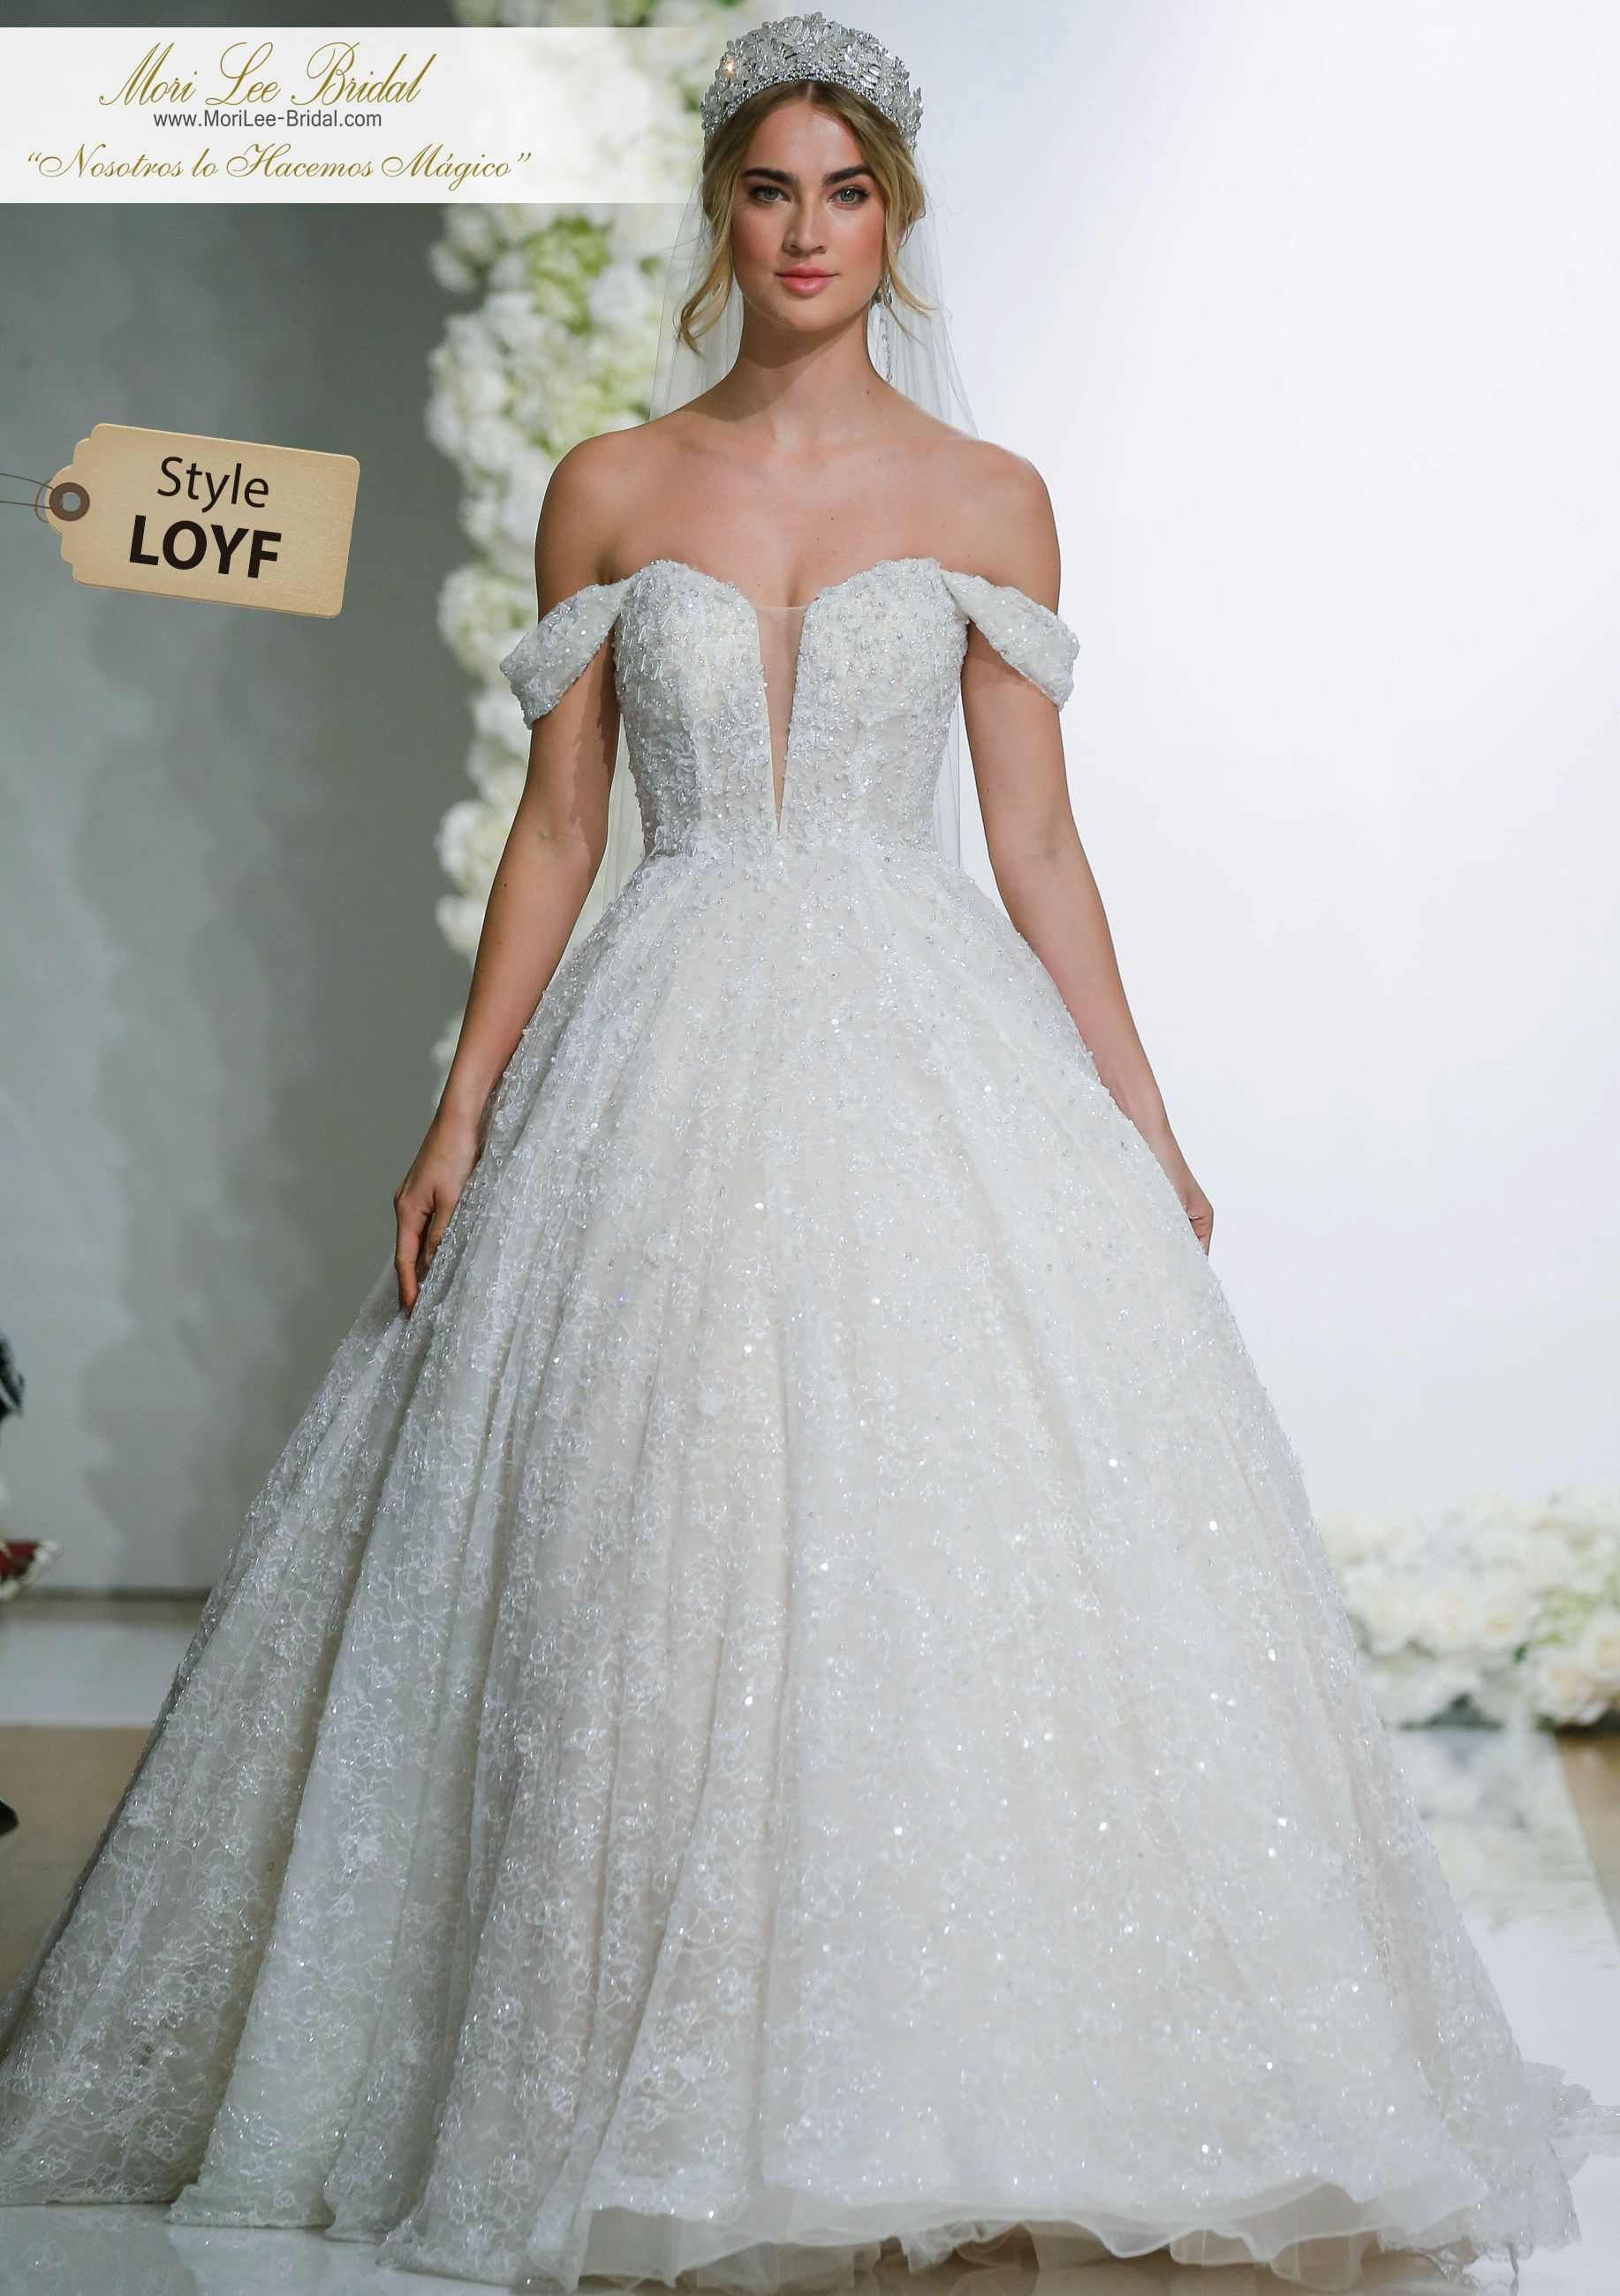 Loyf chantilly lace wedding dress and romantic